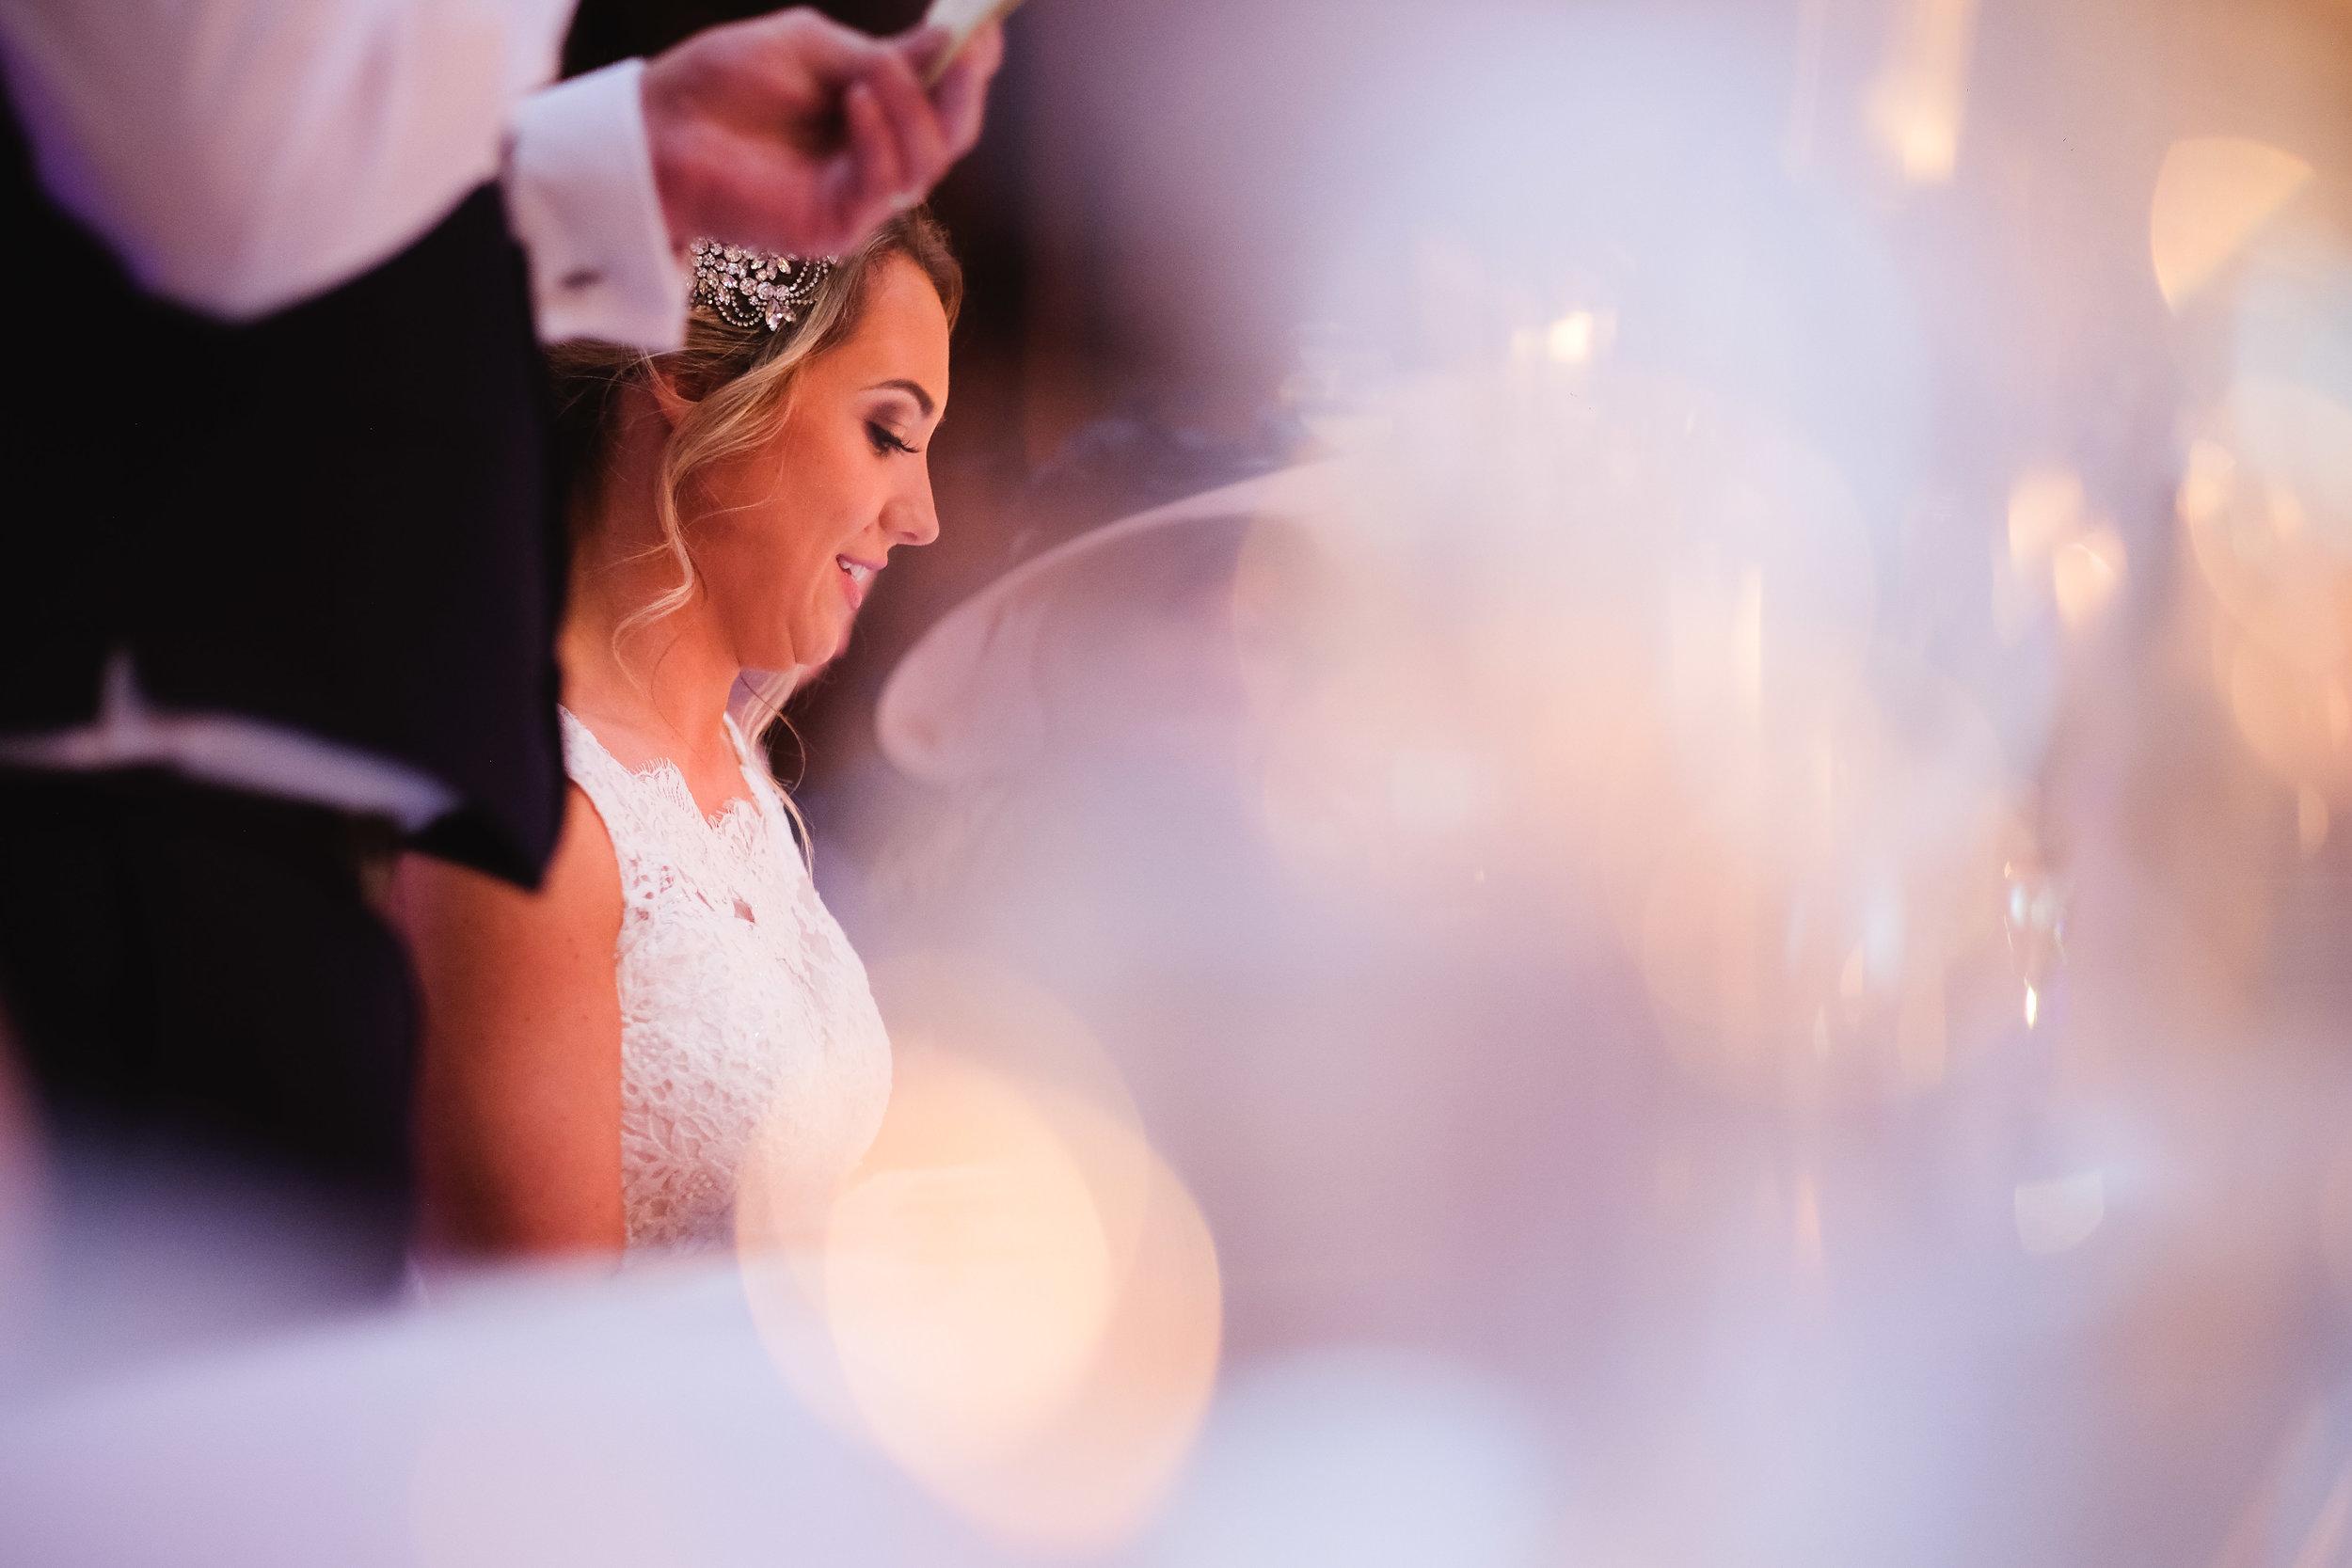 Thornton manor wedding photography cheshire wedding photographer liverpool manchester warrington chester wirral wedding BLOG (67 of 108).jpg